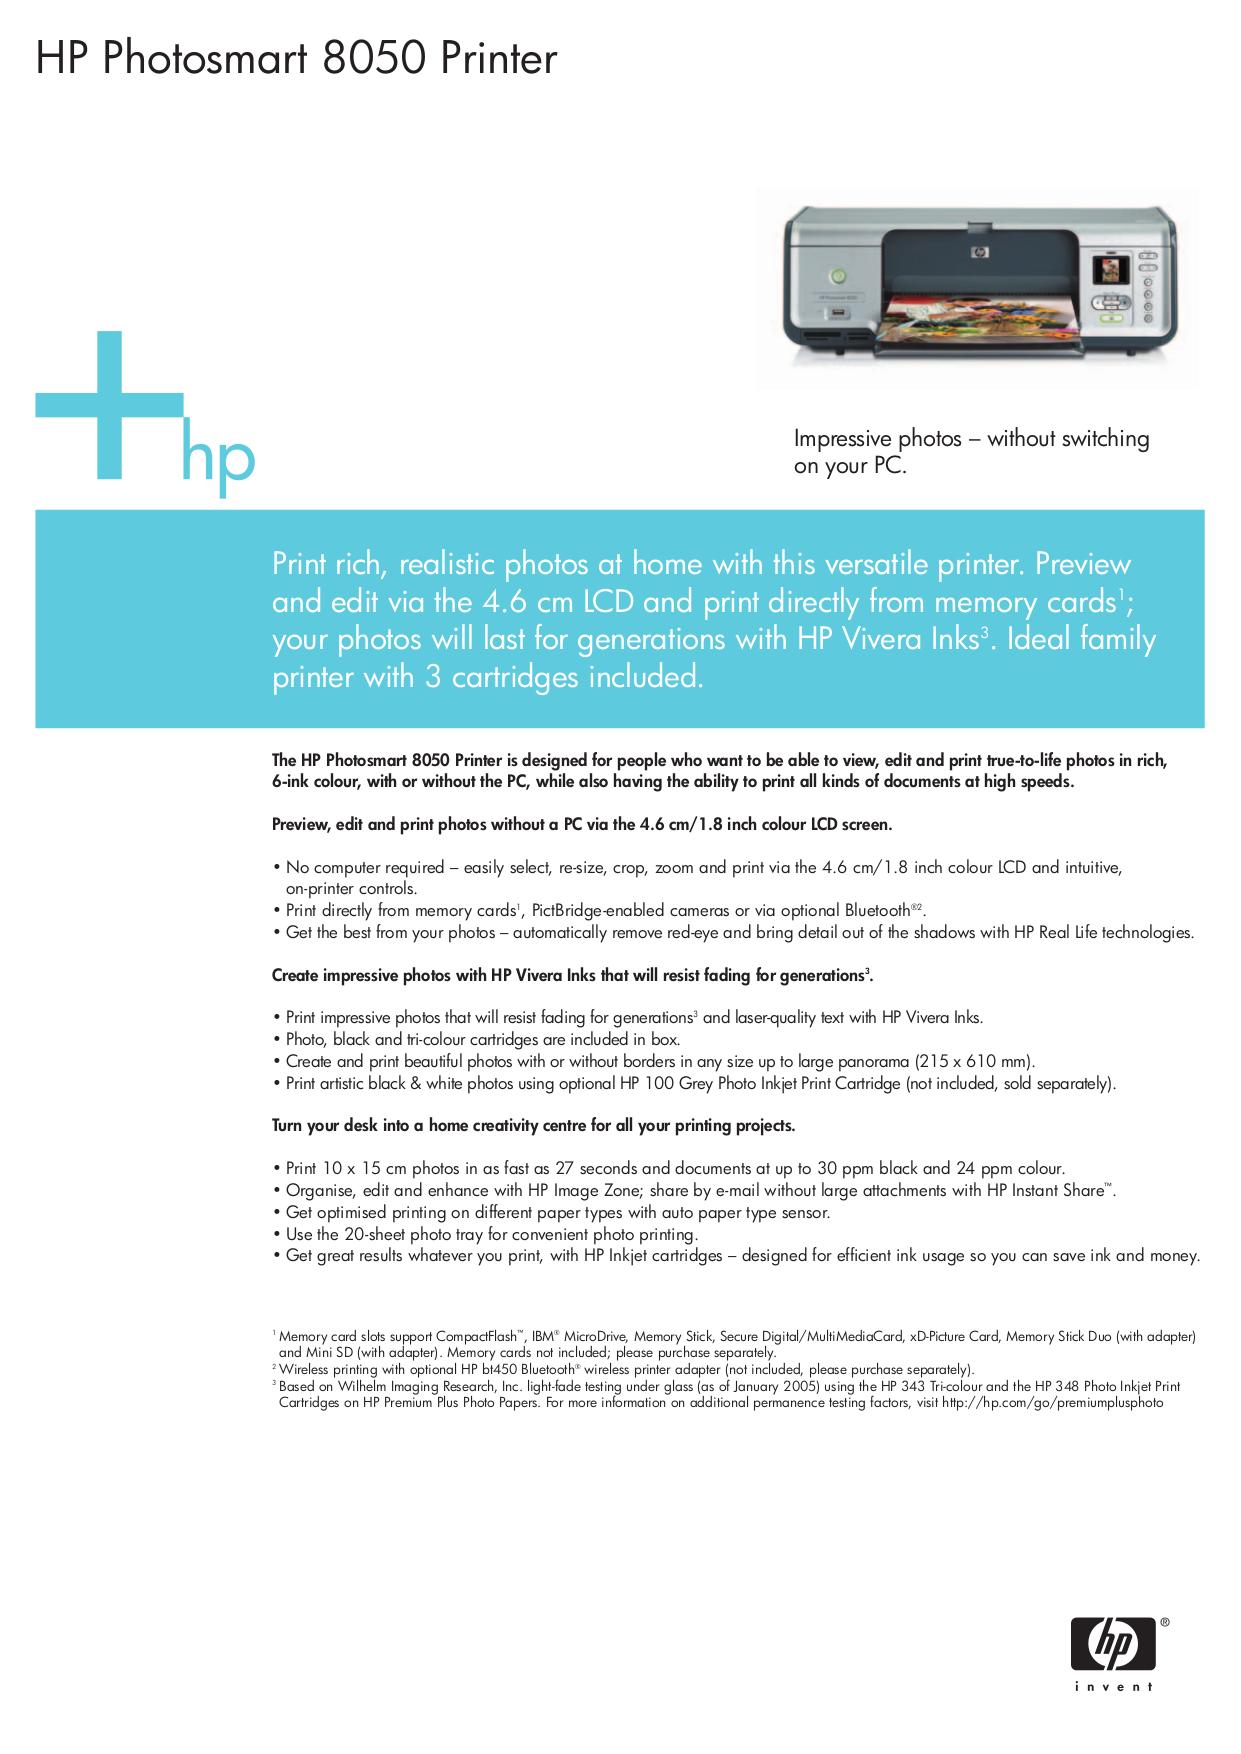 Hp Photosmart C3180 Manual Pdf